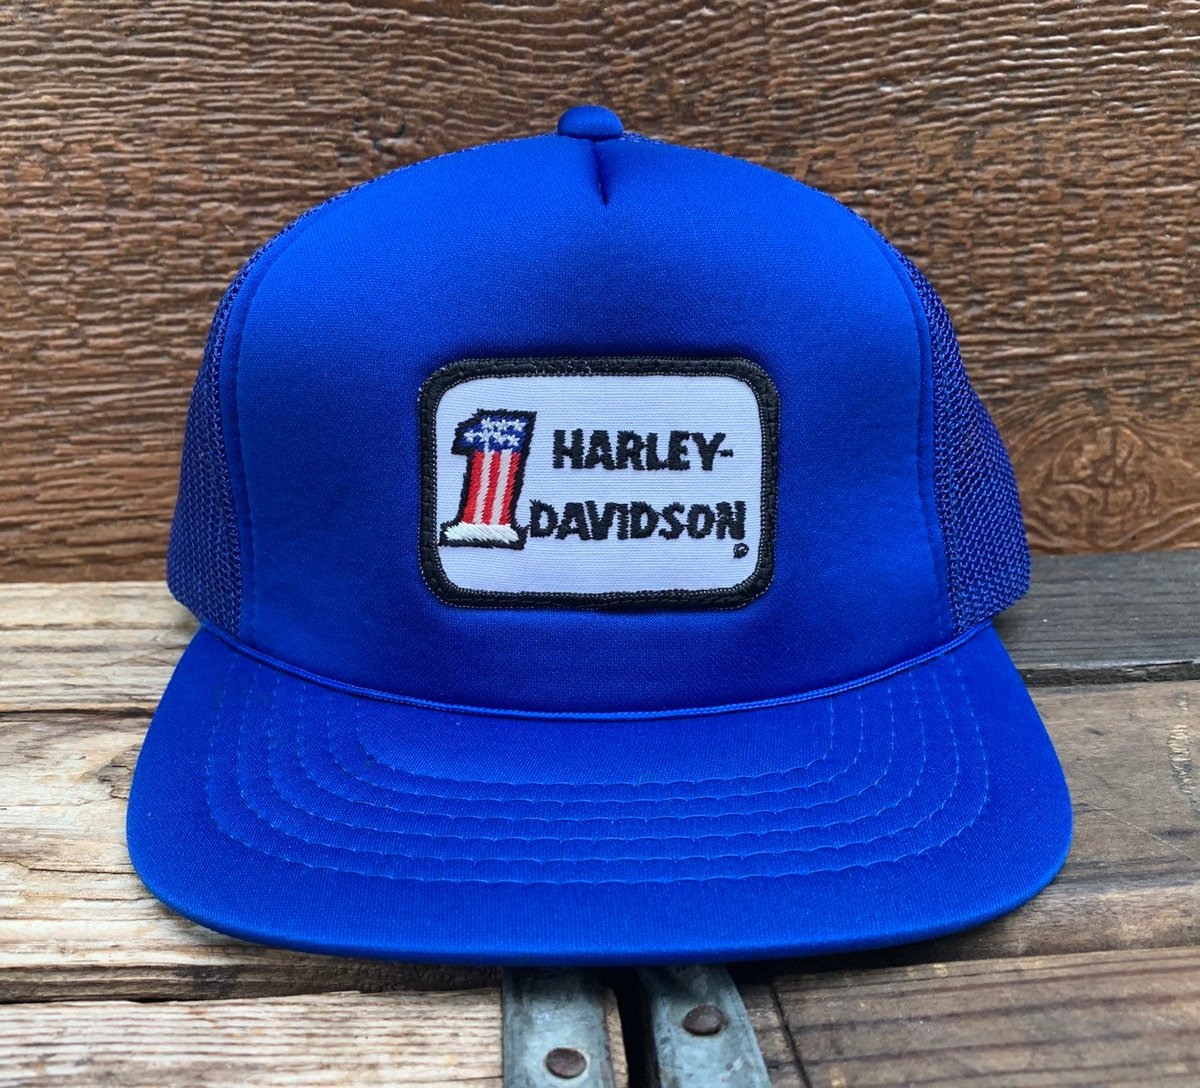 72b704aadca Harley davidson motorcycles vintage blue mesh snapback trucker hat jpg  1200x1088 Vintage etsy trucker snapback mesh